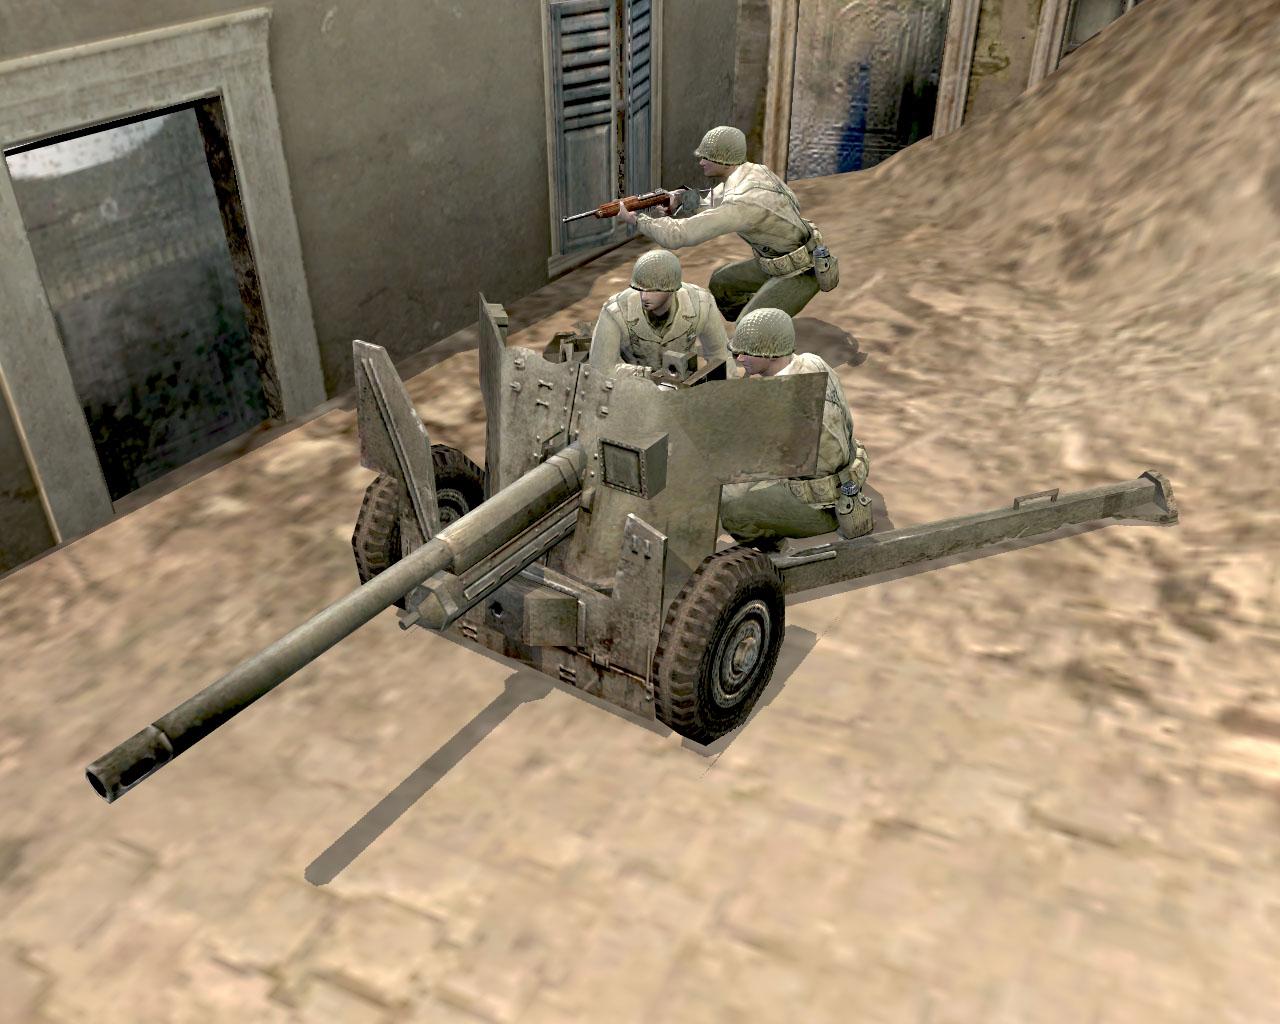 German 50 Mm Anti Tank Gun: Company Of Heroes Wiki